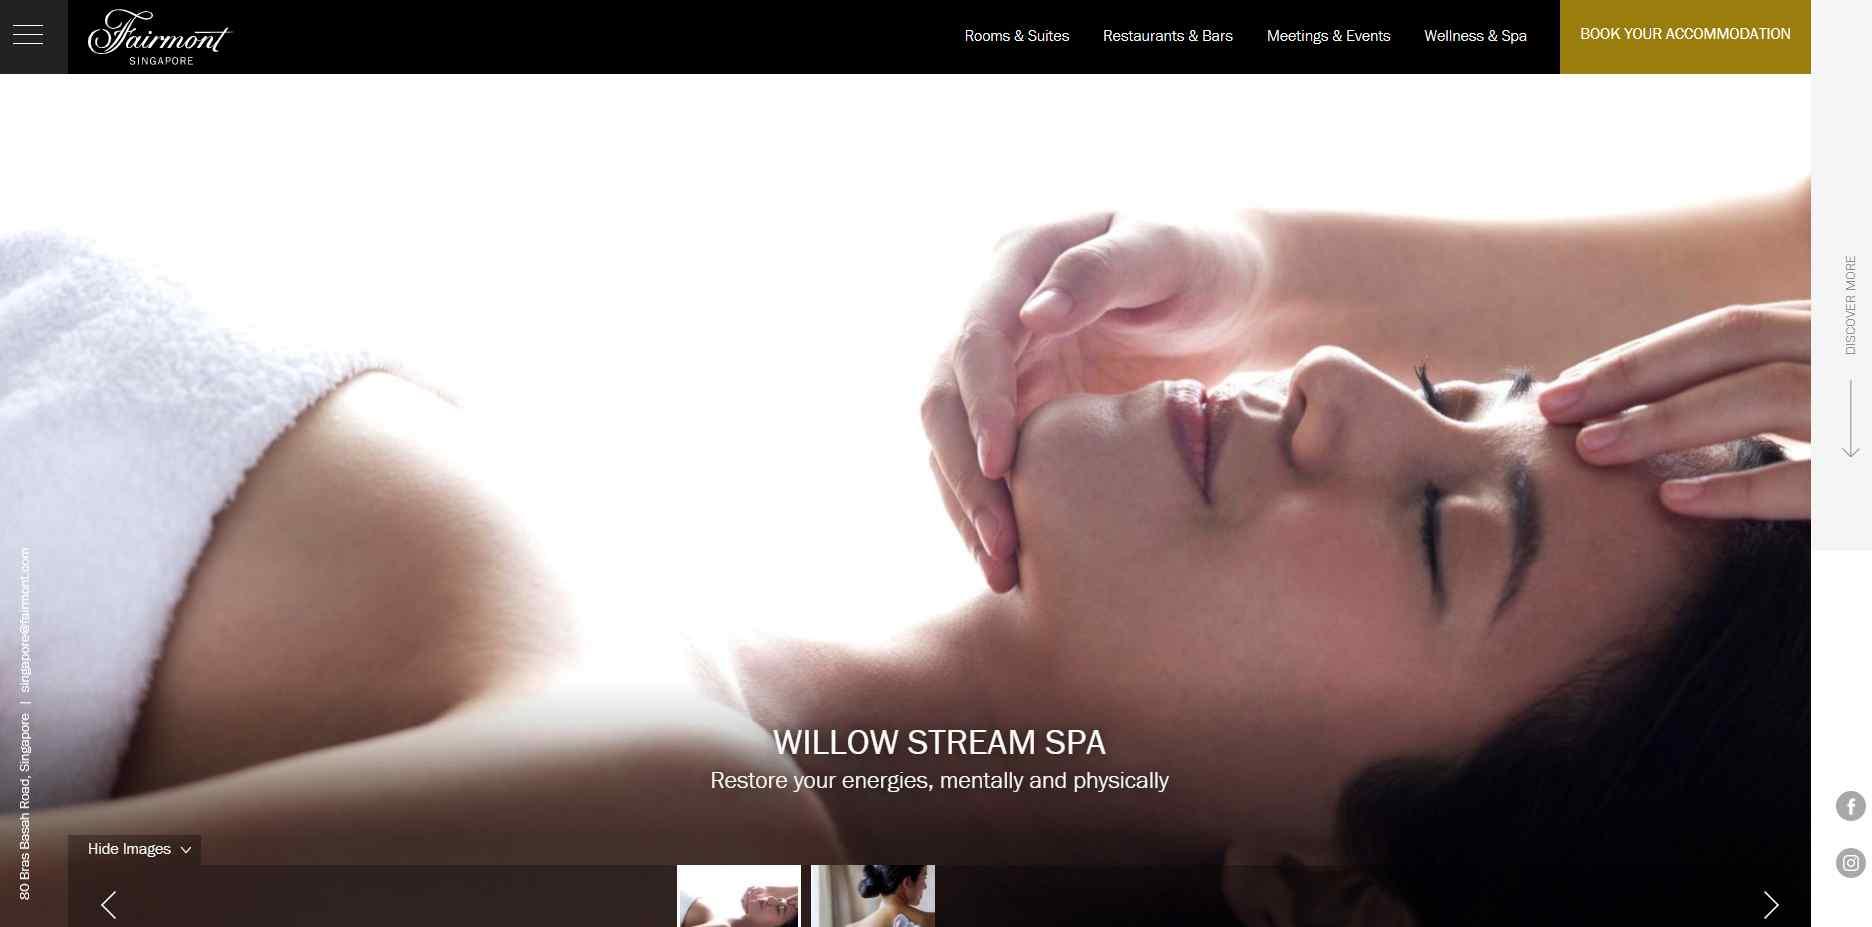 willow stream Top Couple Spas in Singapore